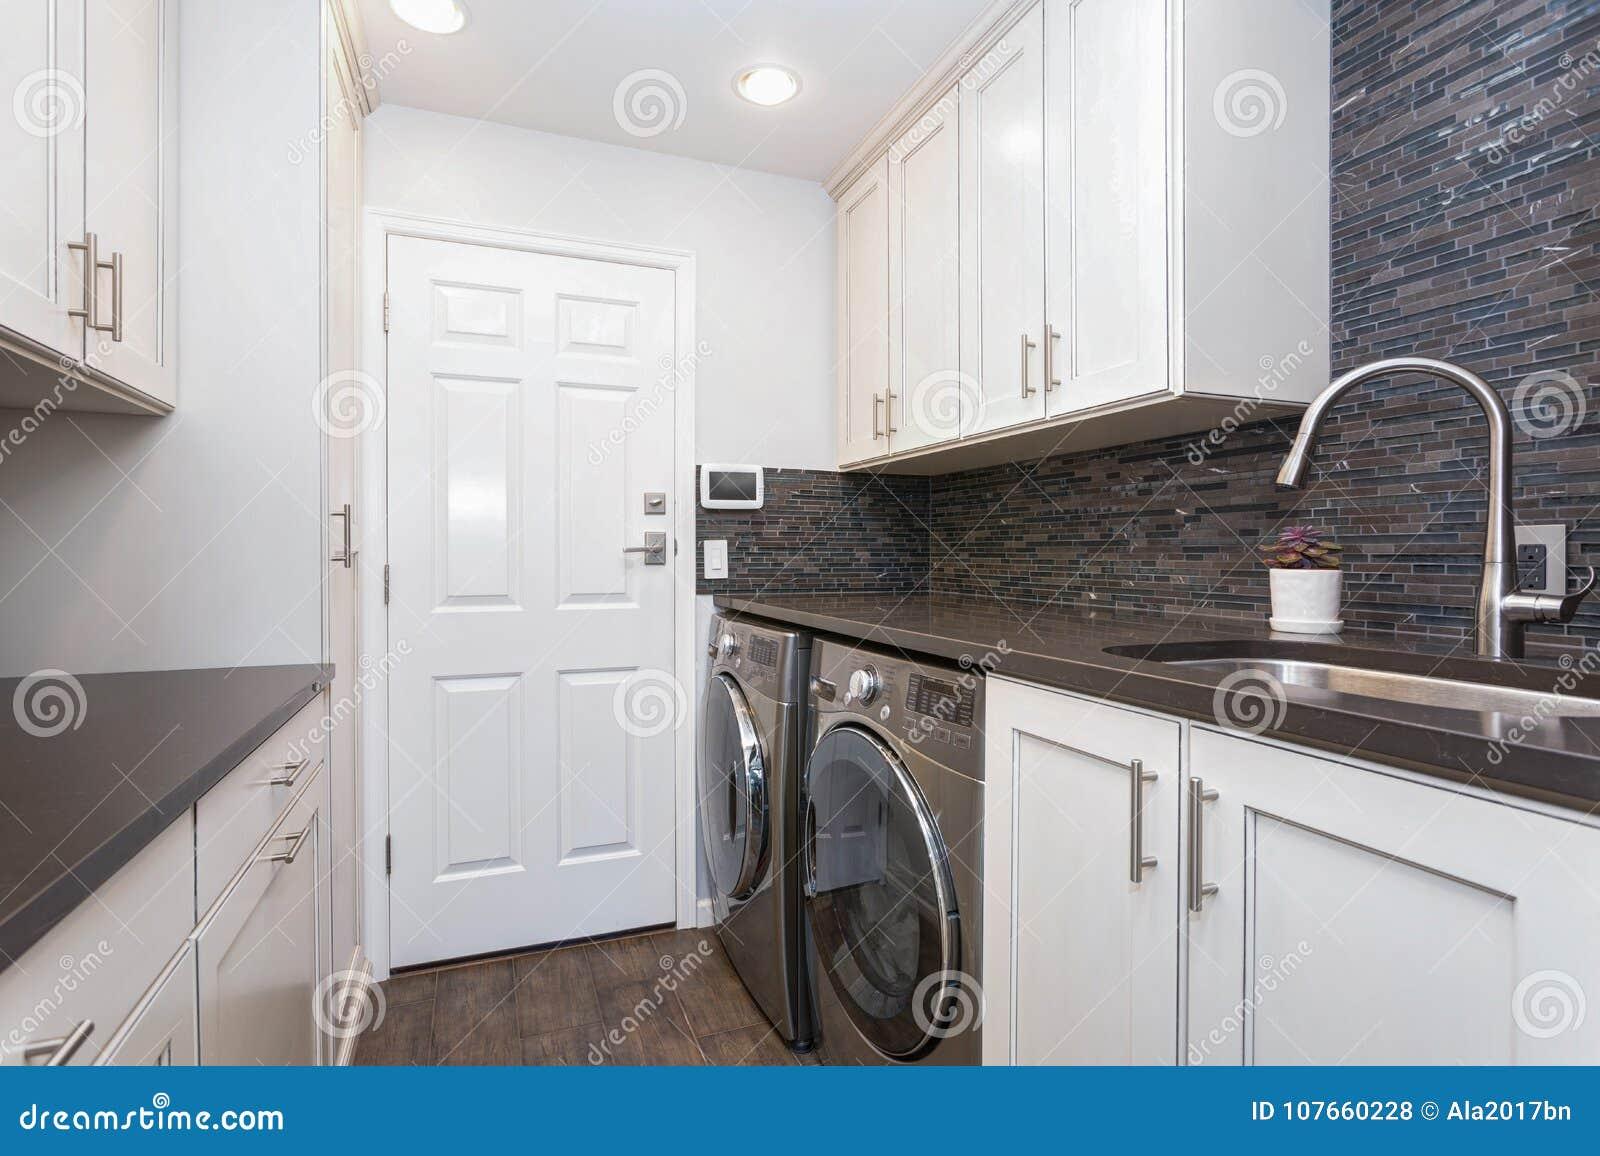 White Laundry Room Boasts White Shaker Cabinets Stock Photo Image Of Architecture Property 107660228